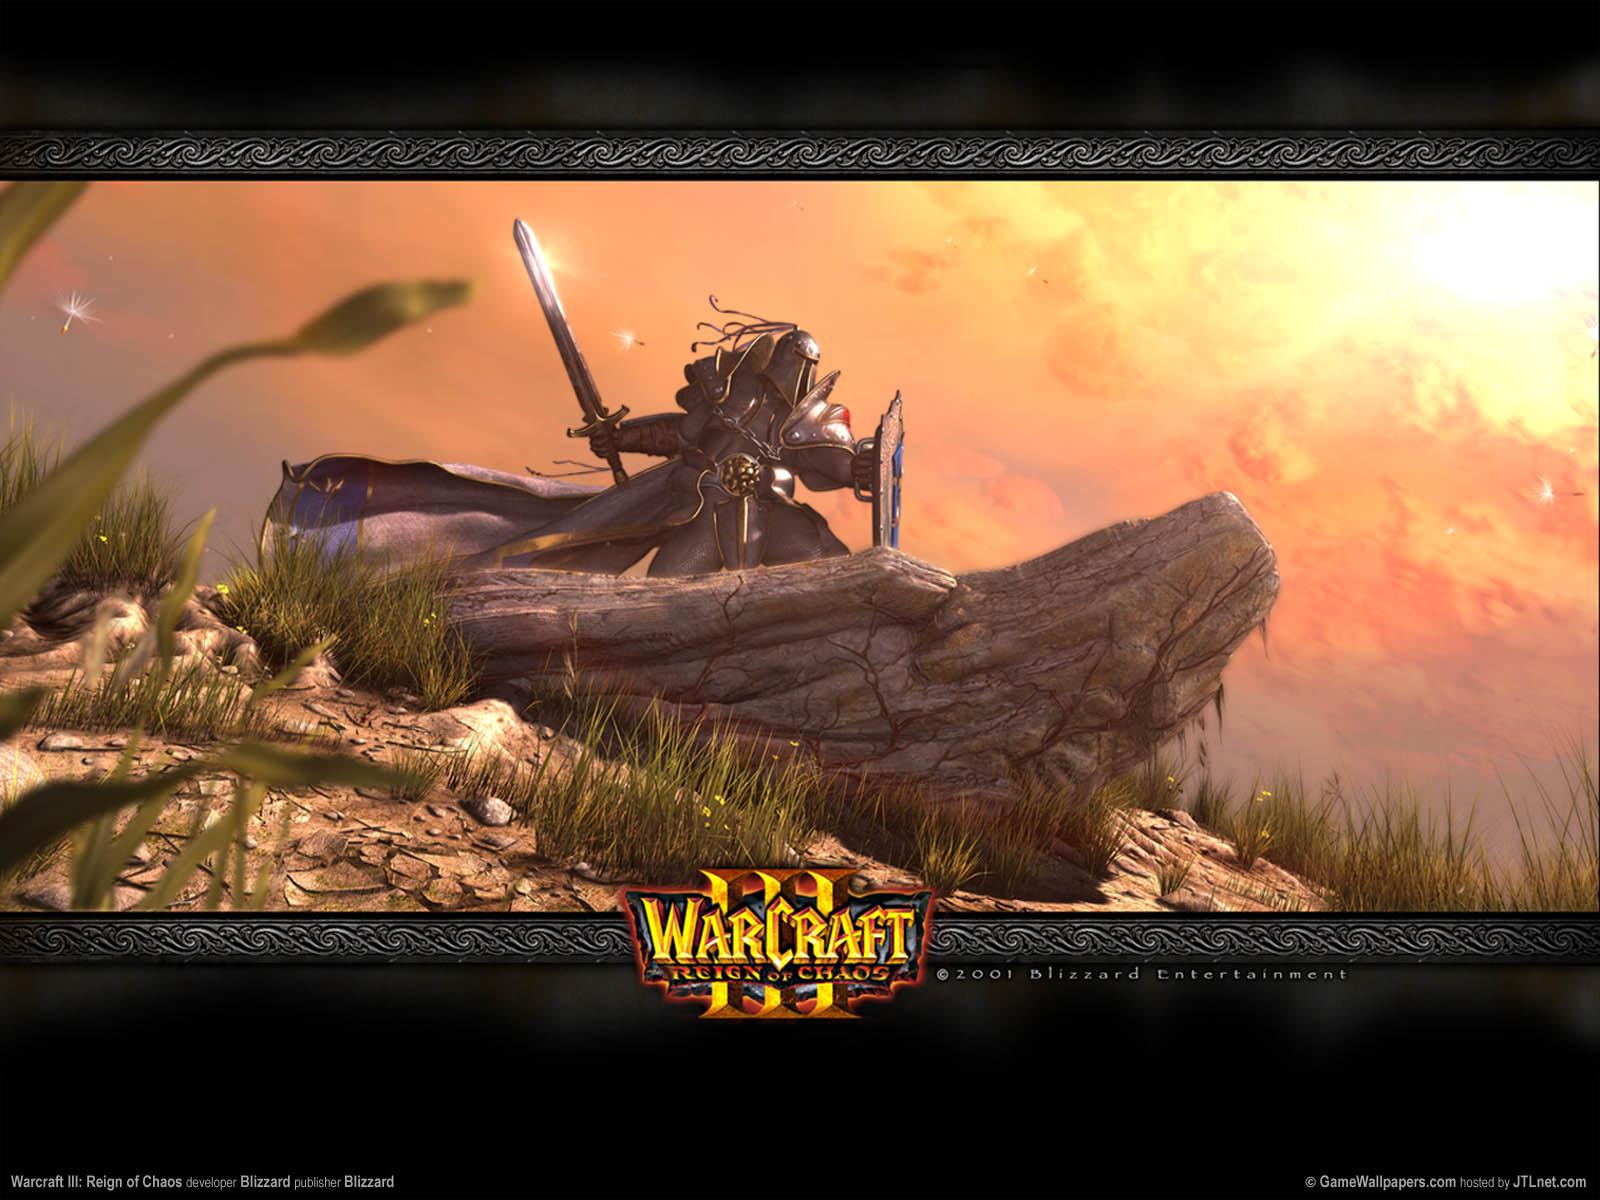 Warcraft 3: Reign of Chaos Hintergrundbild 01 1600x1200